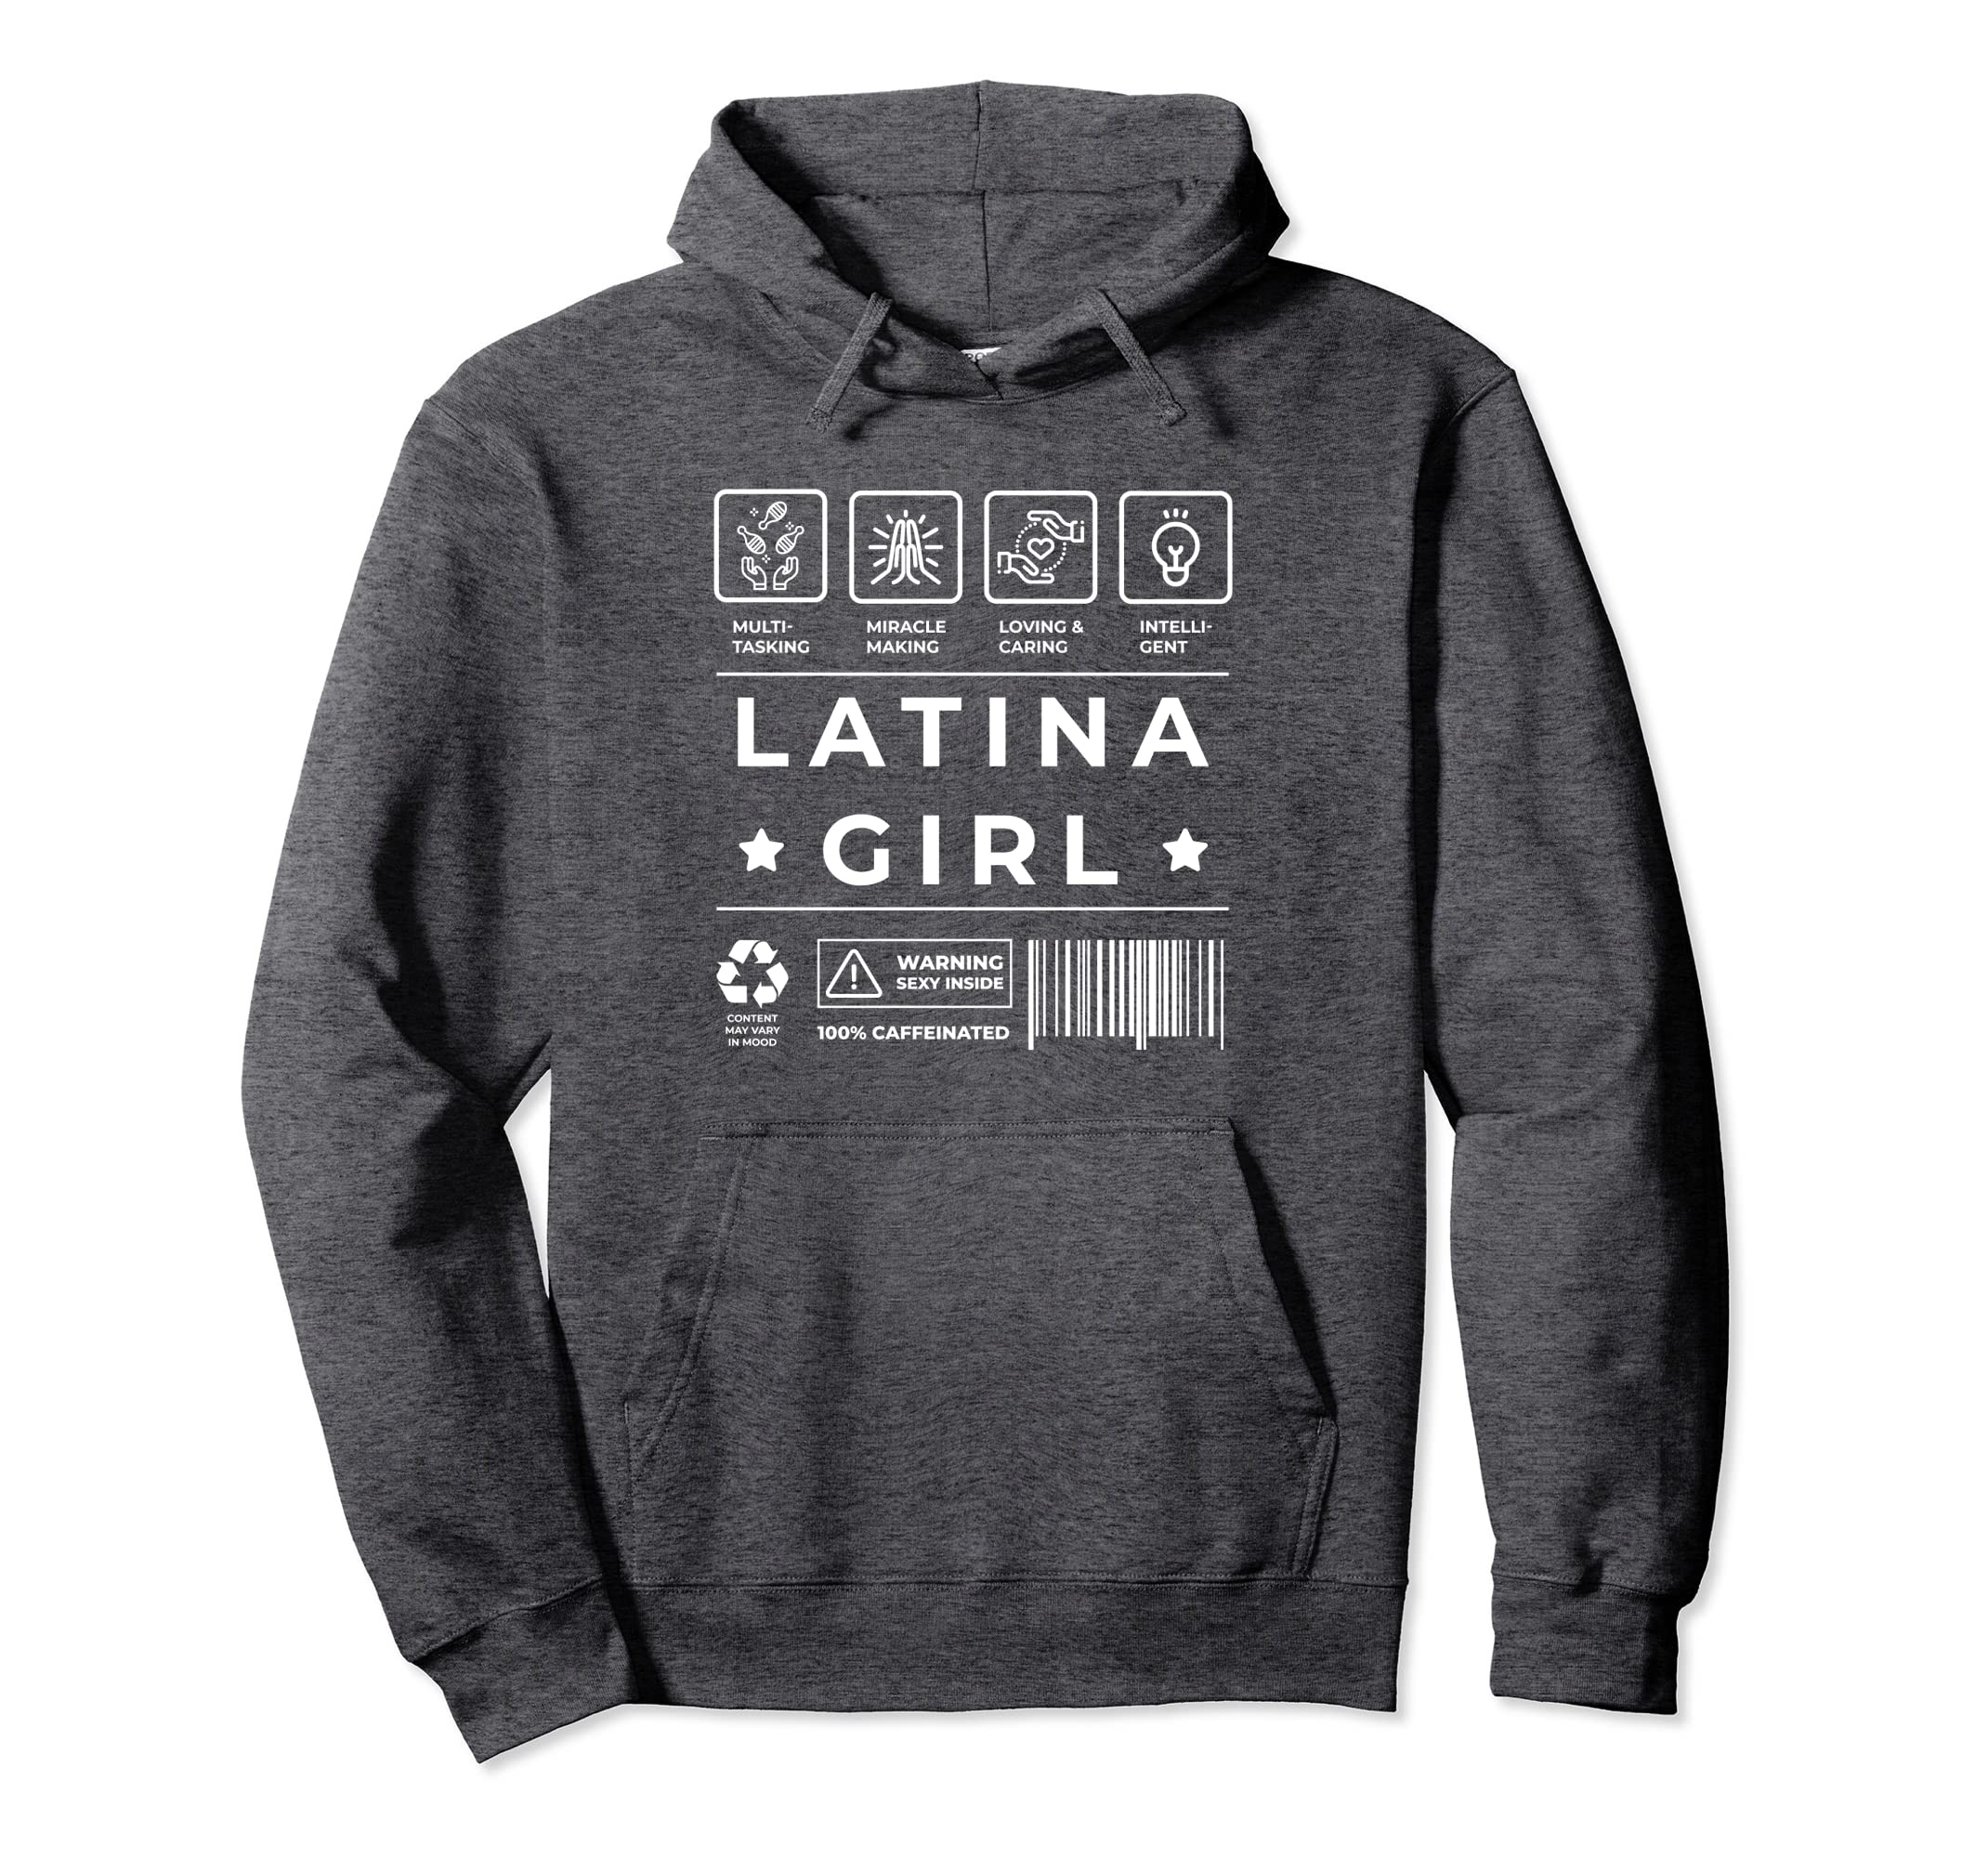 Amazon.com: Latina Power Hoodie for Women Sudadera Mujer Latina: Clothing